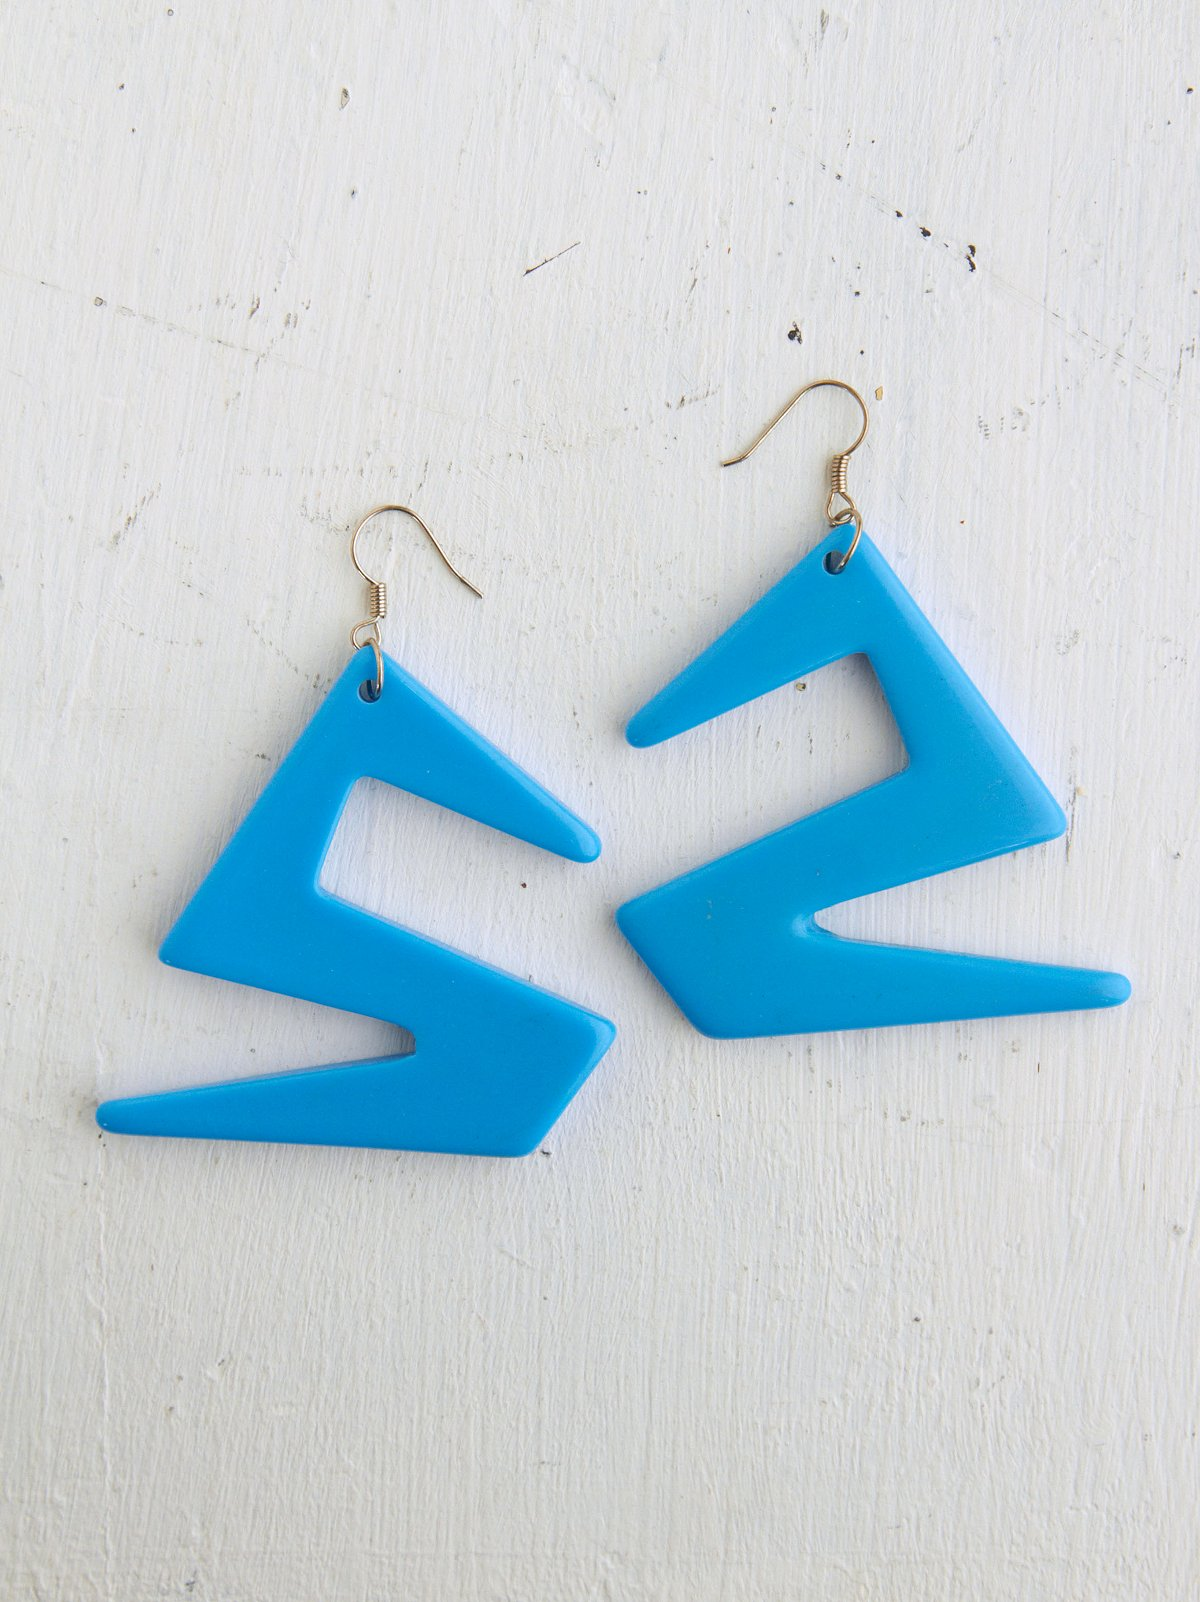 Vintage Blue Geometric Shaped Earrings